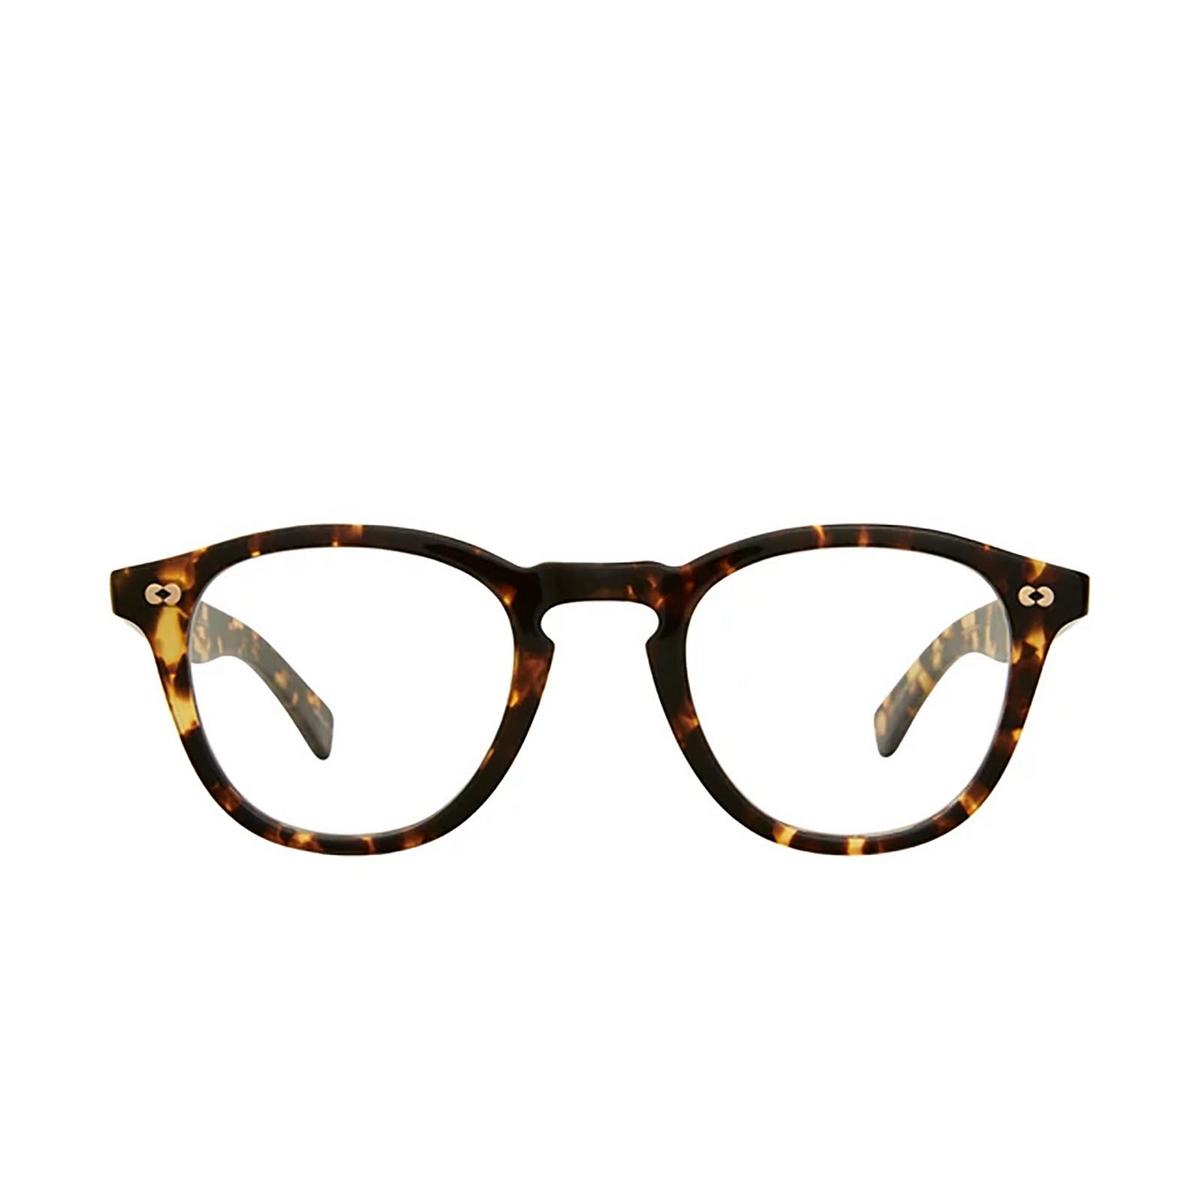 Garrett Leight® Square Eyeglasses: Hampton X color Tuscan Tortoise Tut - front view.